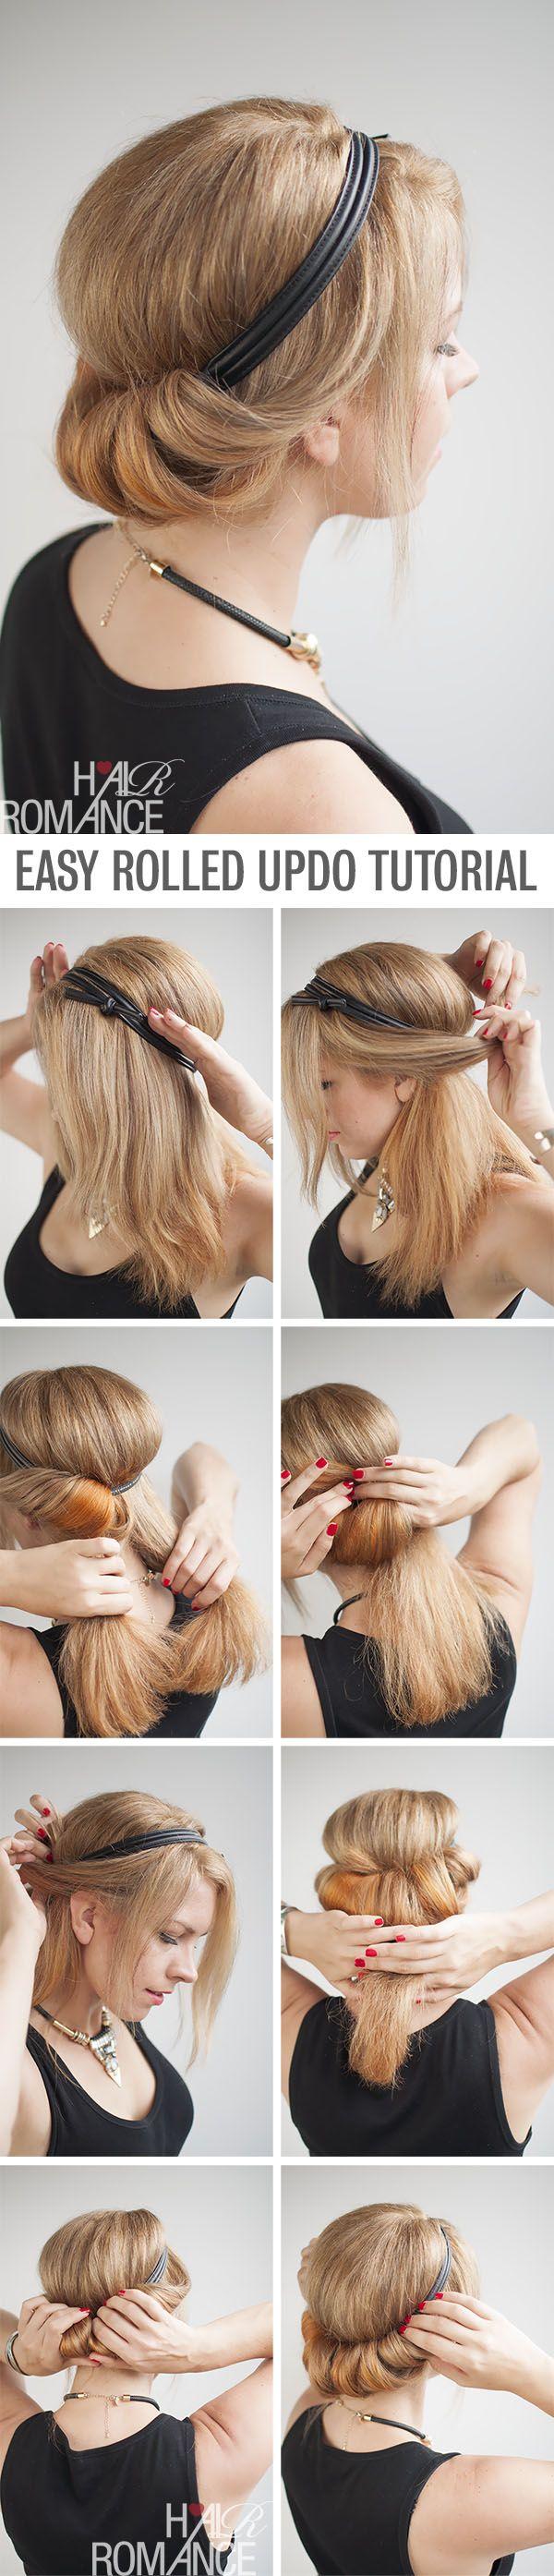 Fabulous 1000 Ideas About 1920S Hair Tutorial On Pinterest Quick Short Hairstyles Gunalazisus